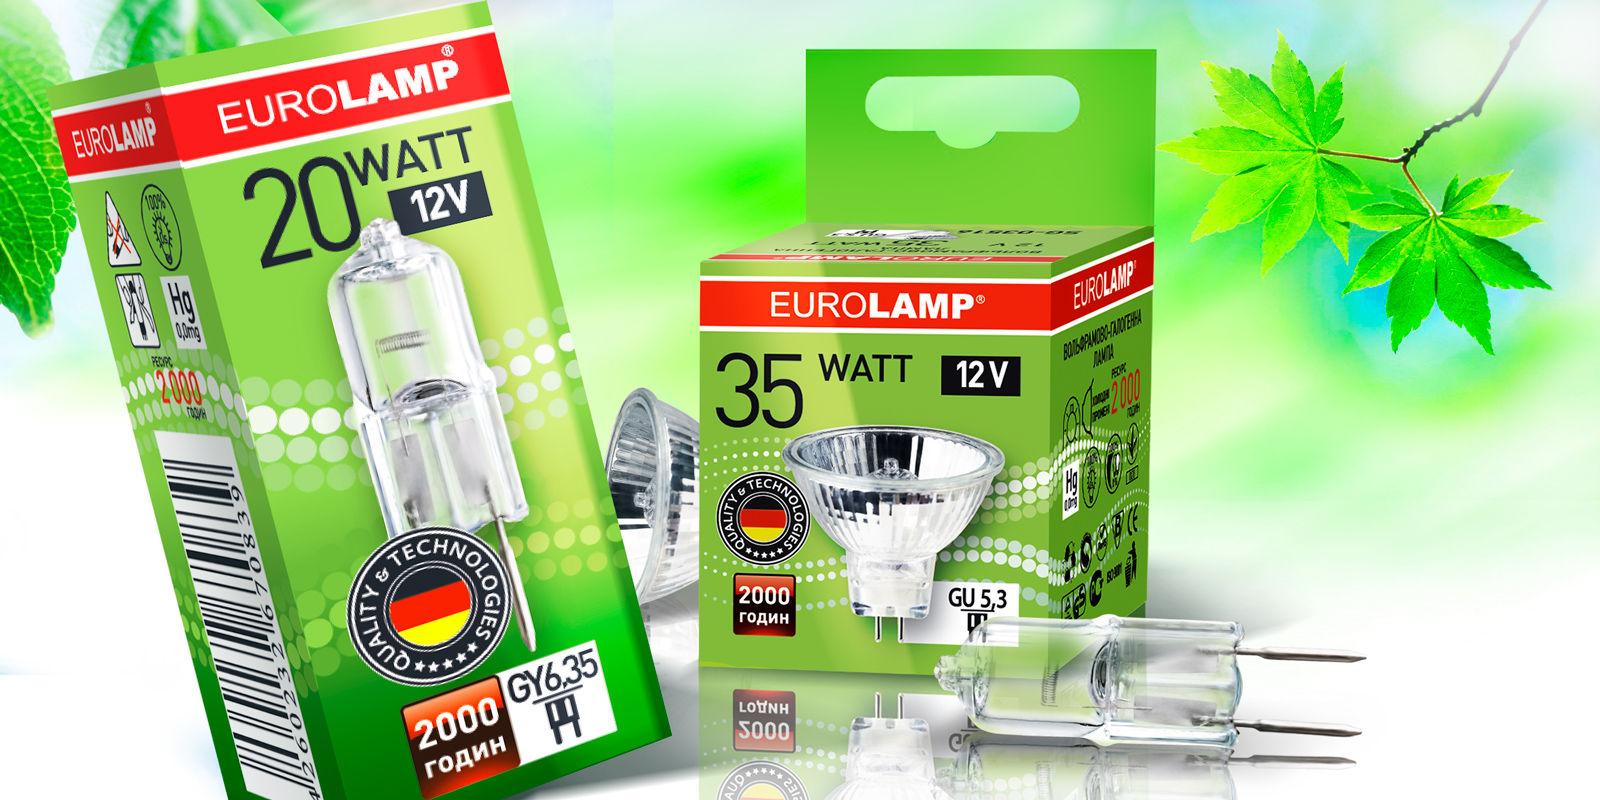 TM Eurolamp;;;;;;Разработка упаковки;;;;;;<span>Клиент:</span> TM Eurolamp;;;;;;;;;;;;Разработка упаковки;;;;;; 2 ;;;;;;